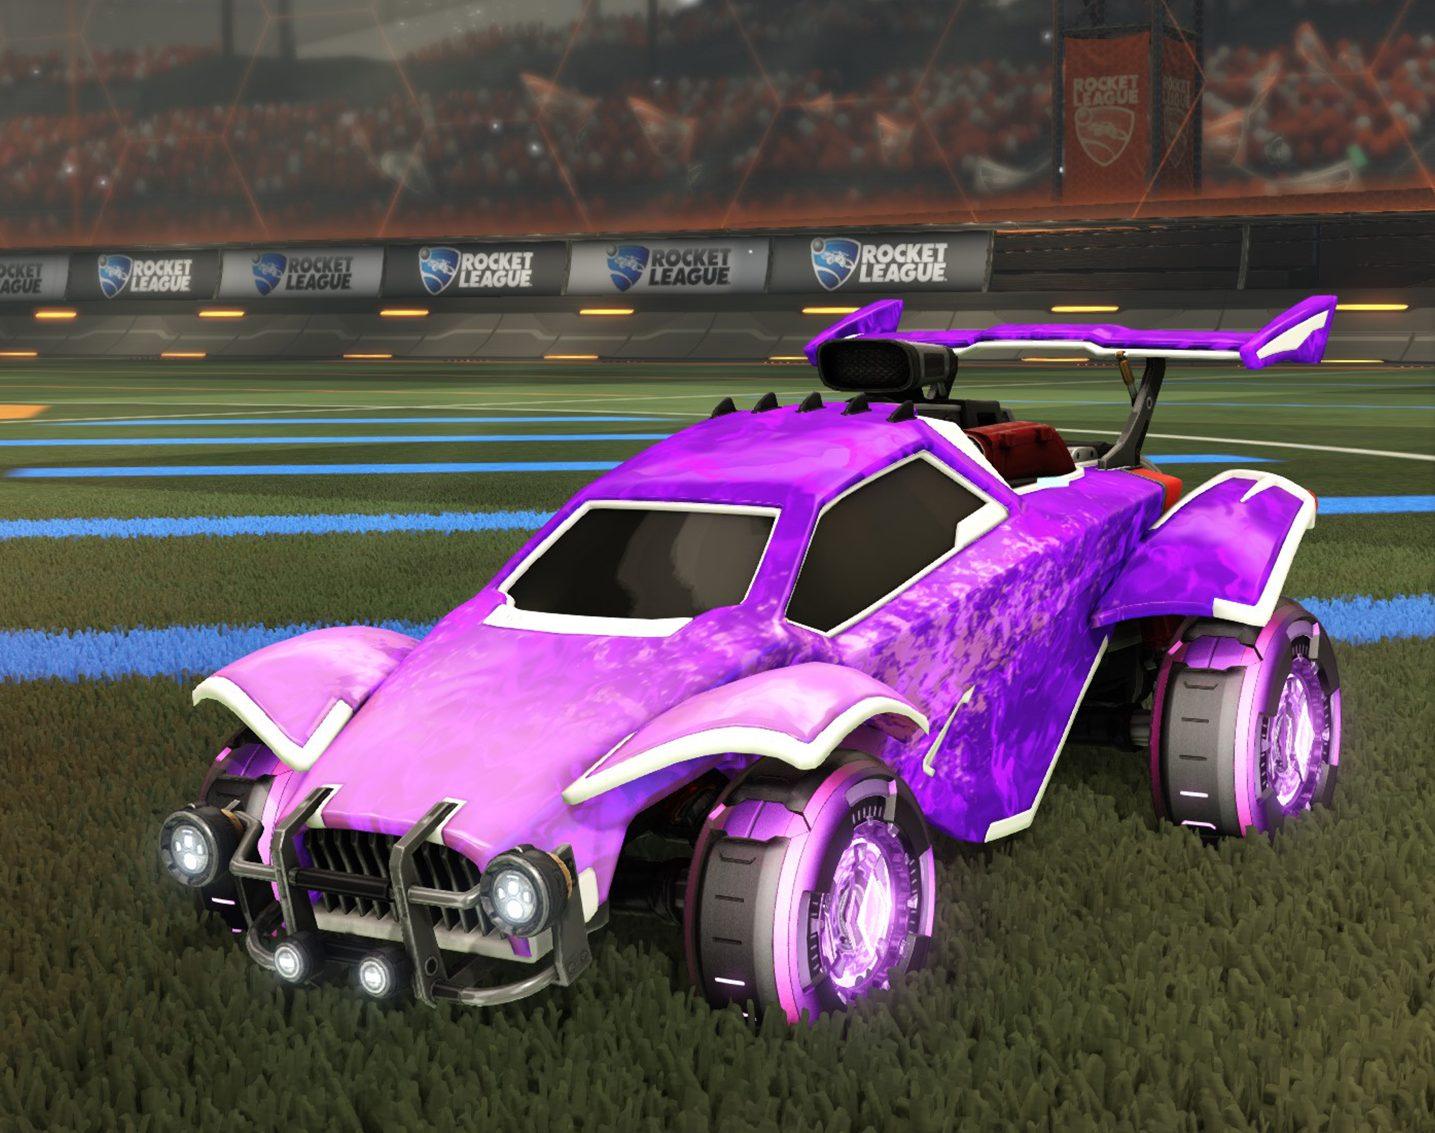 Best Car Rocket League Octane